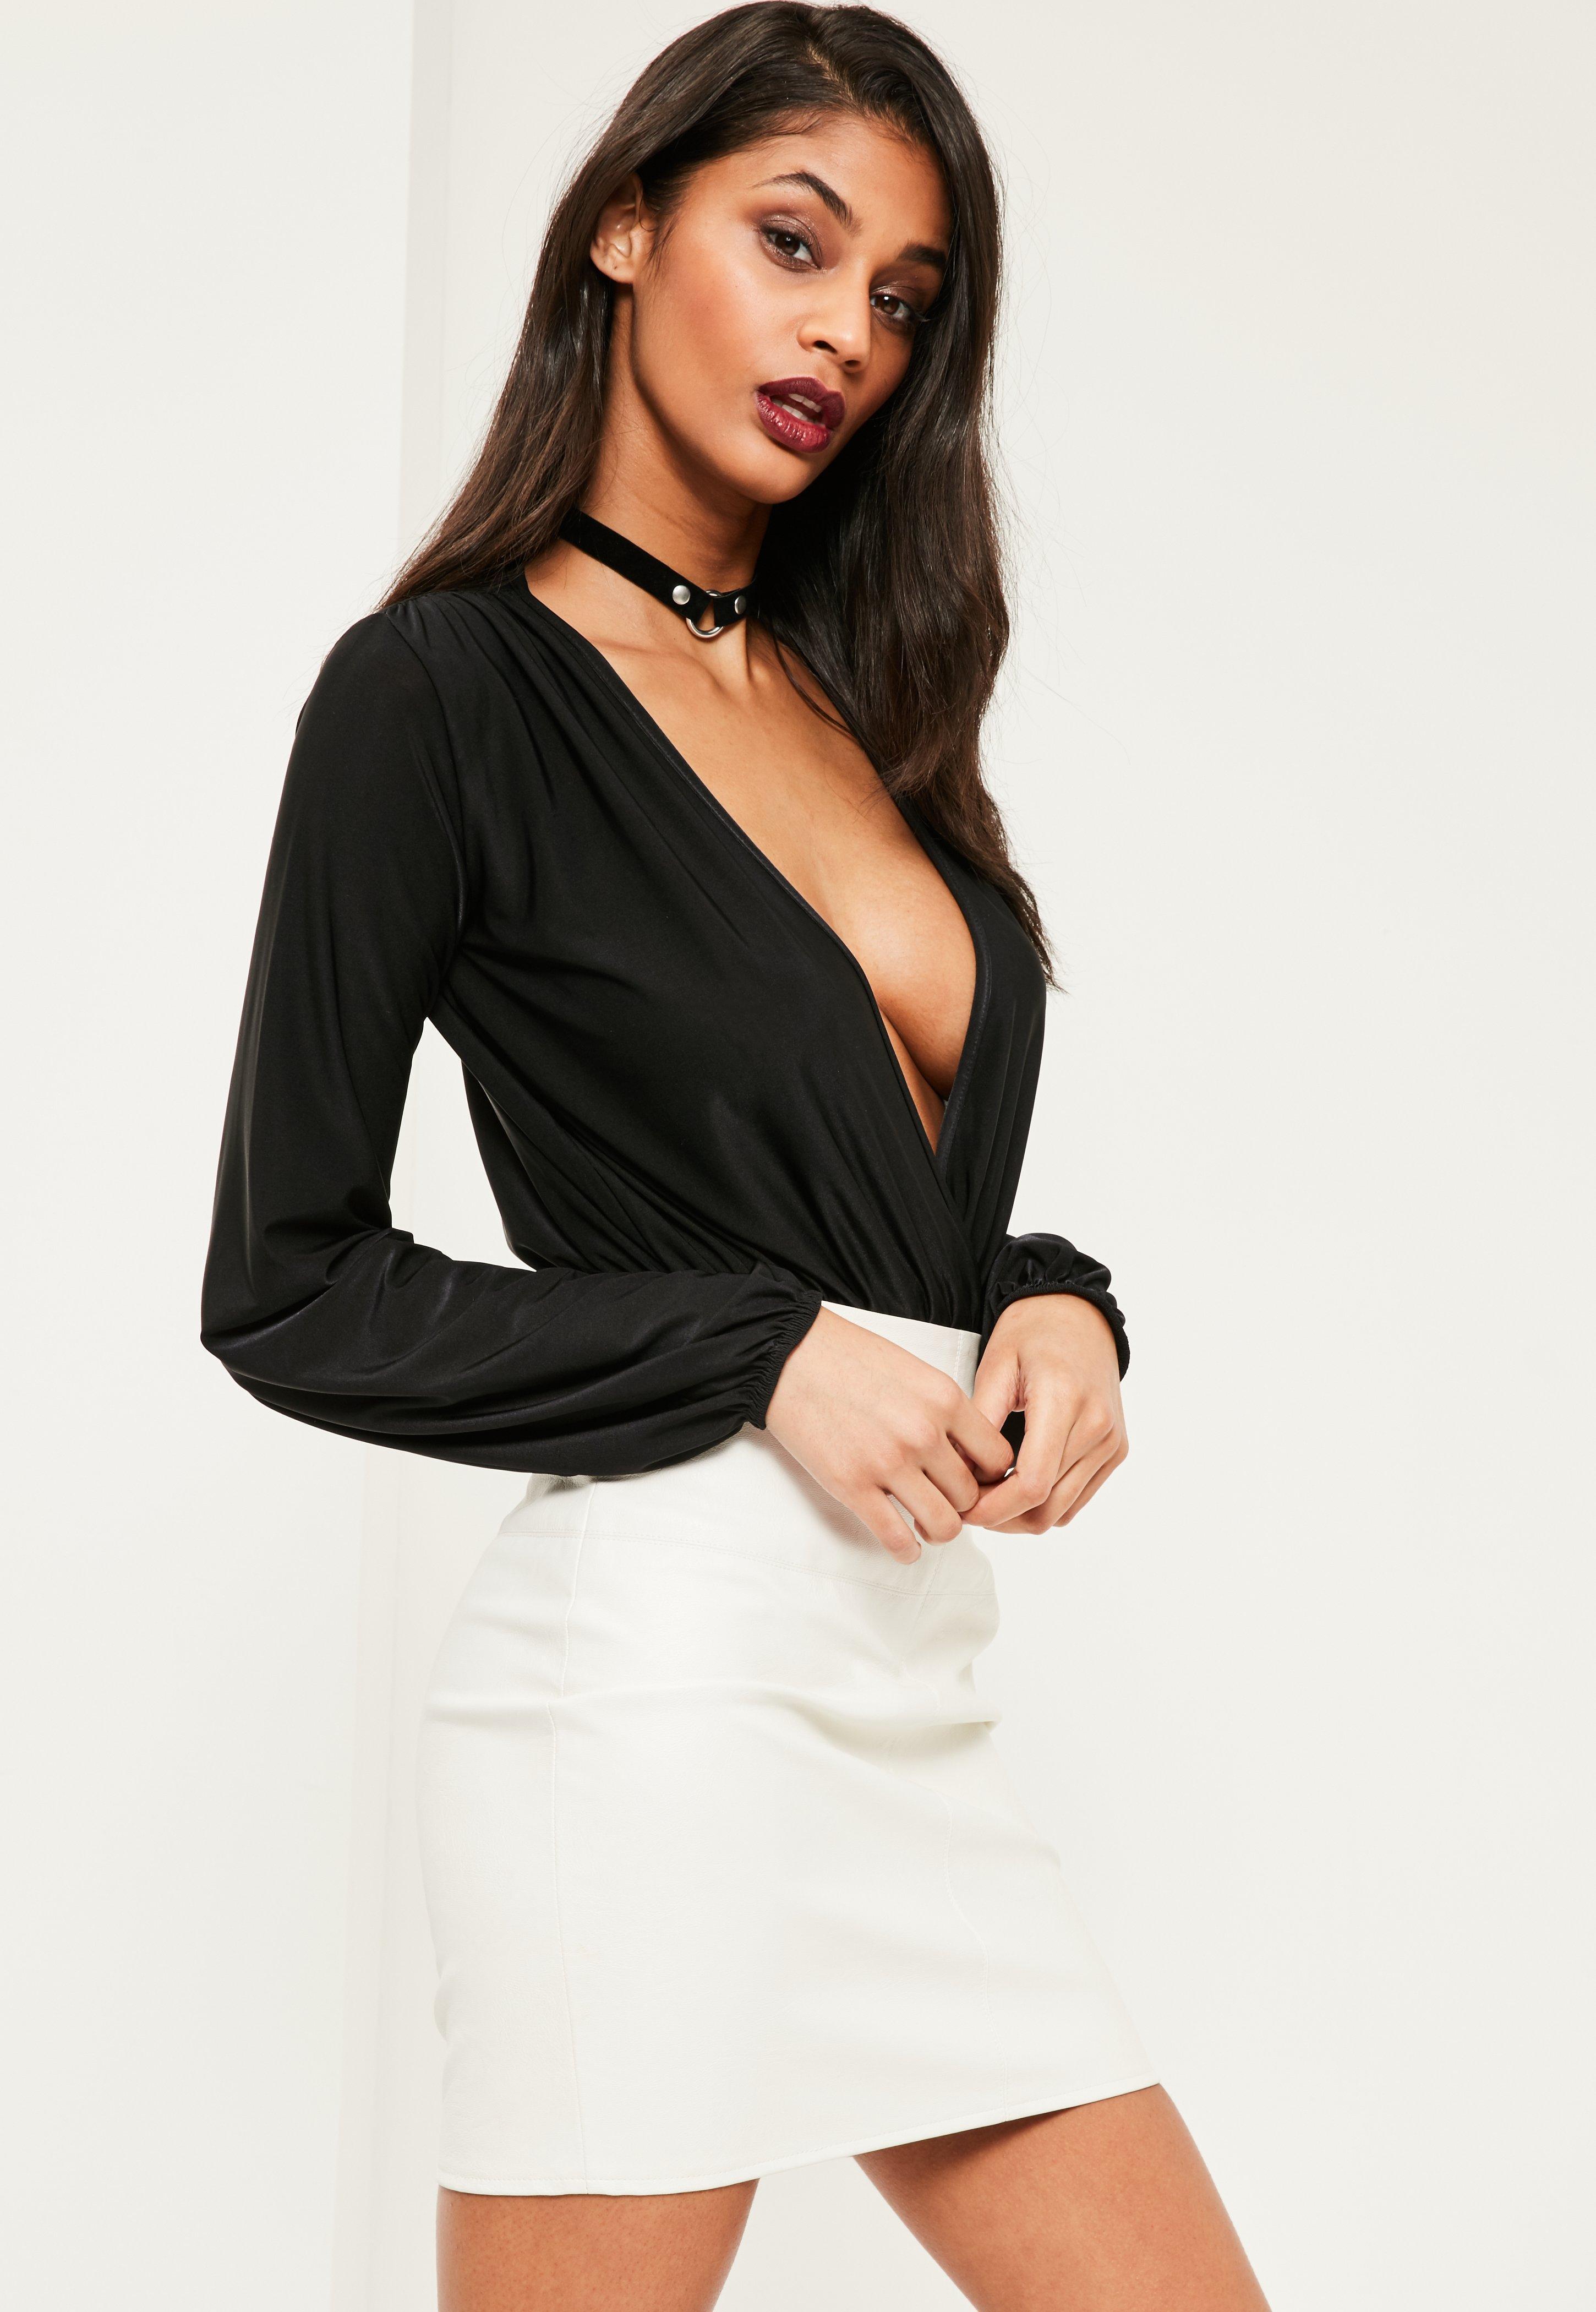 Lyst - Missguided Black Blouson Sleeve Wrap Front Bodysuit in Black 98c48ba47